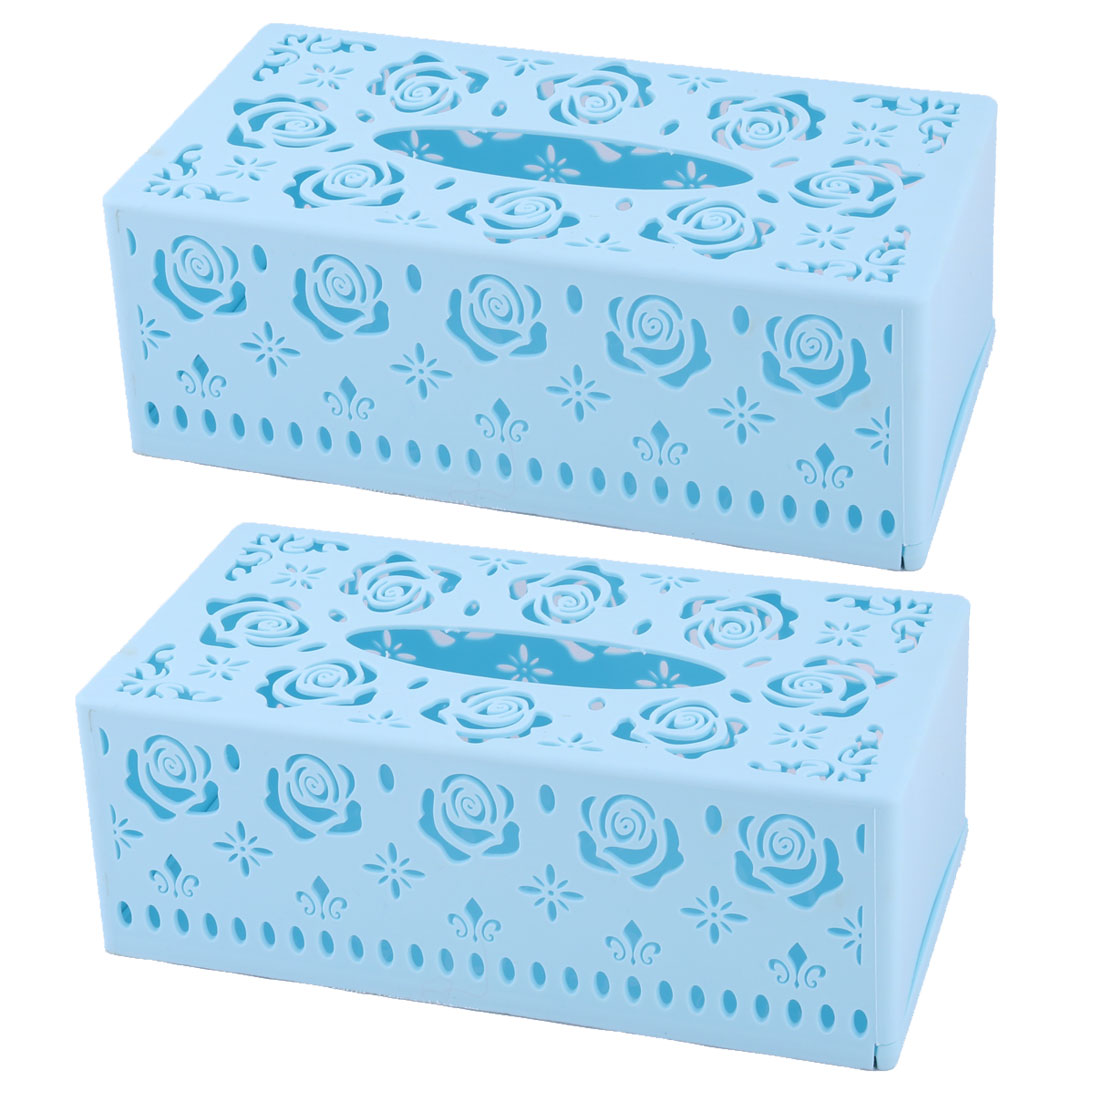 Home Plastic Rectangle Hollow Out Design Tissue Box Case Holder Organizer Sky Blue 2pcs